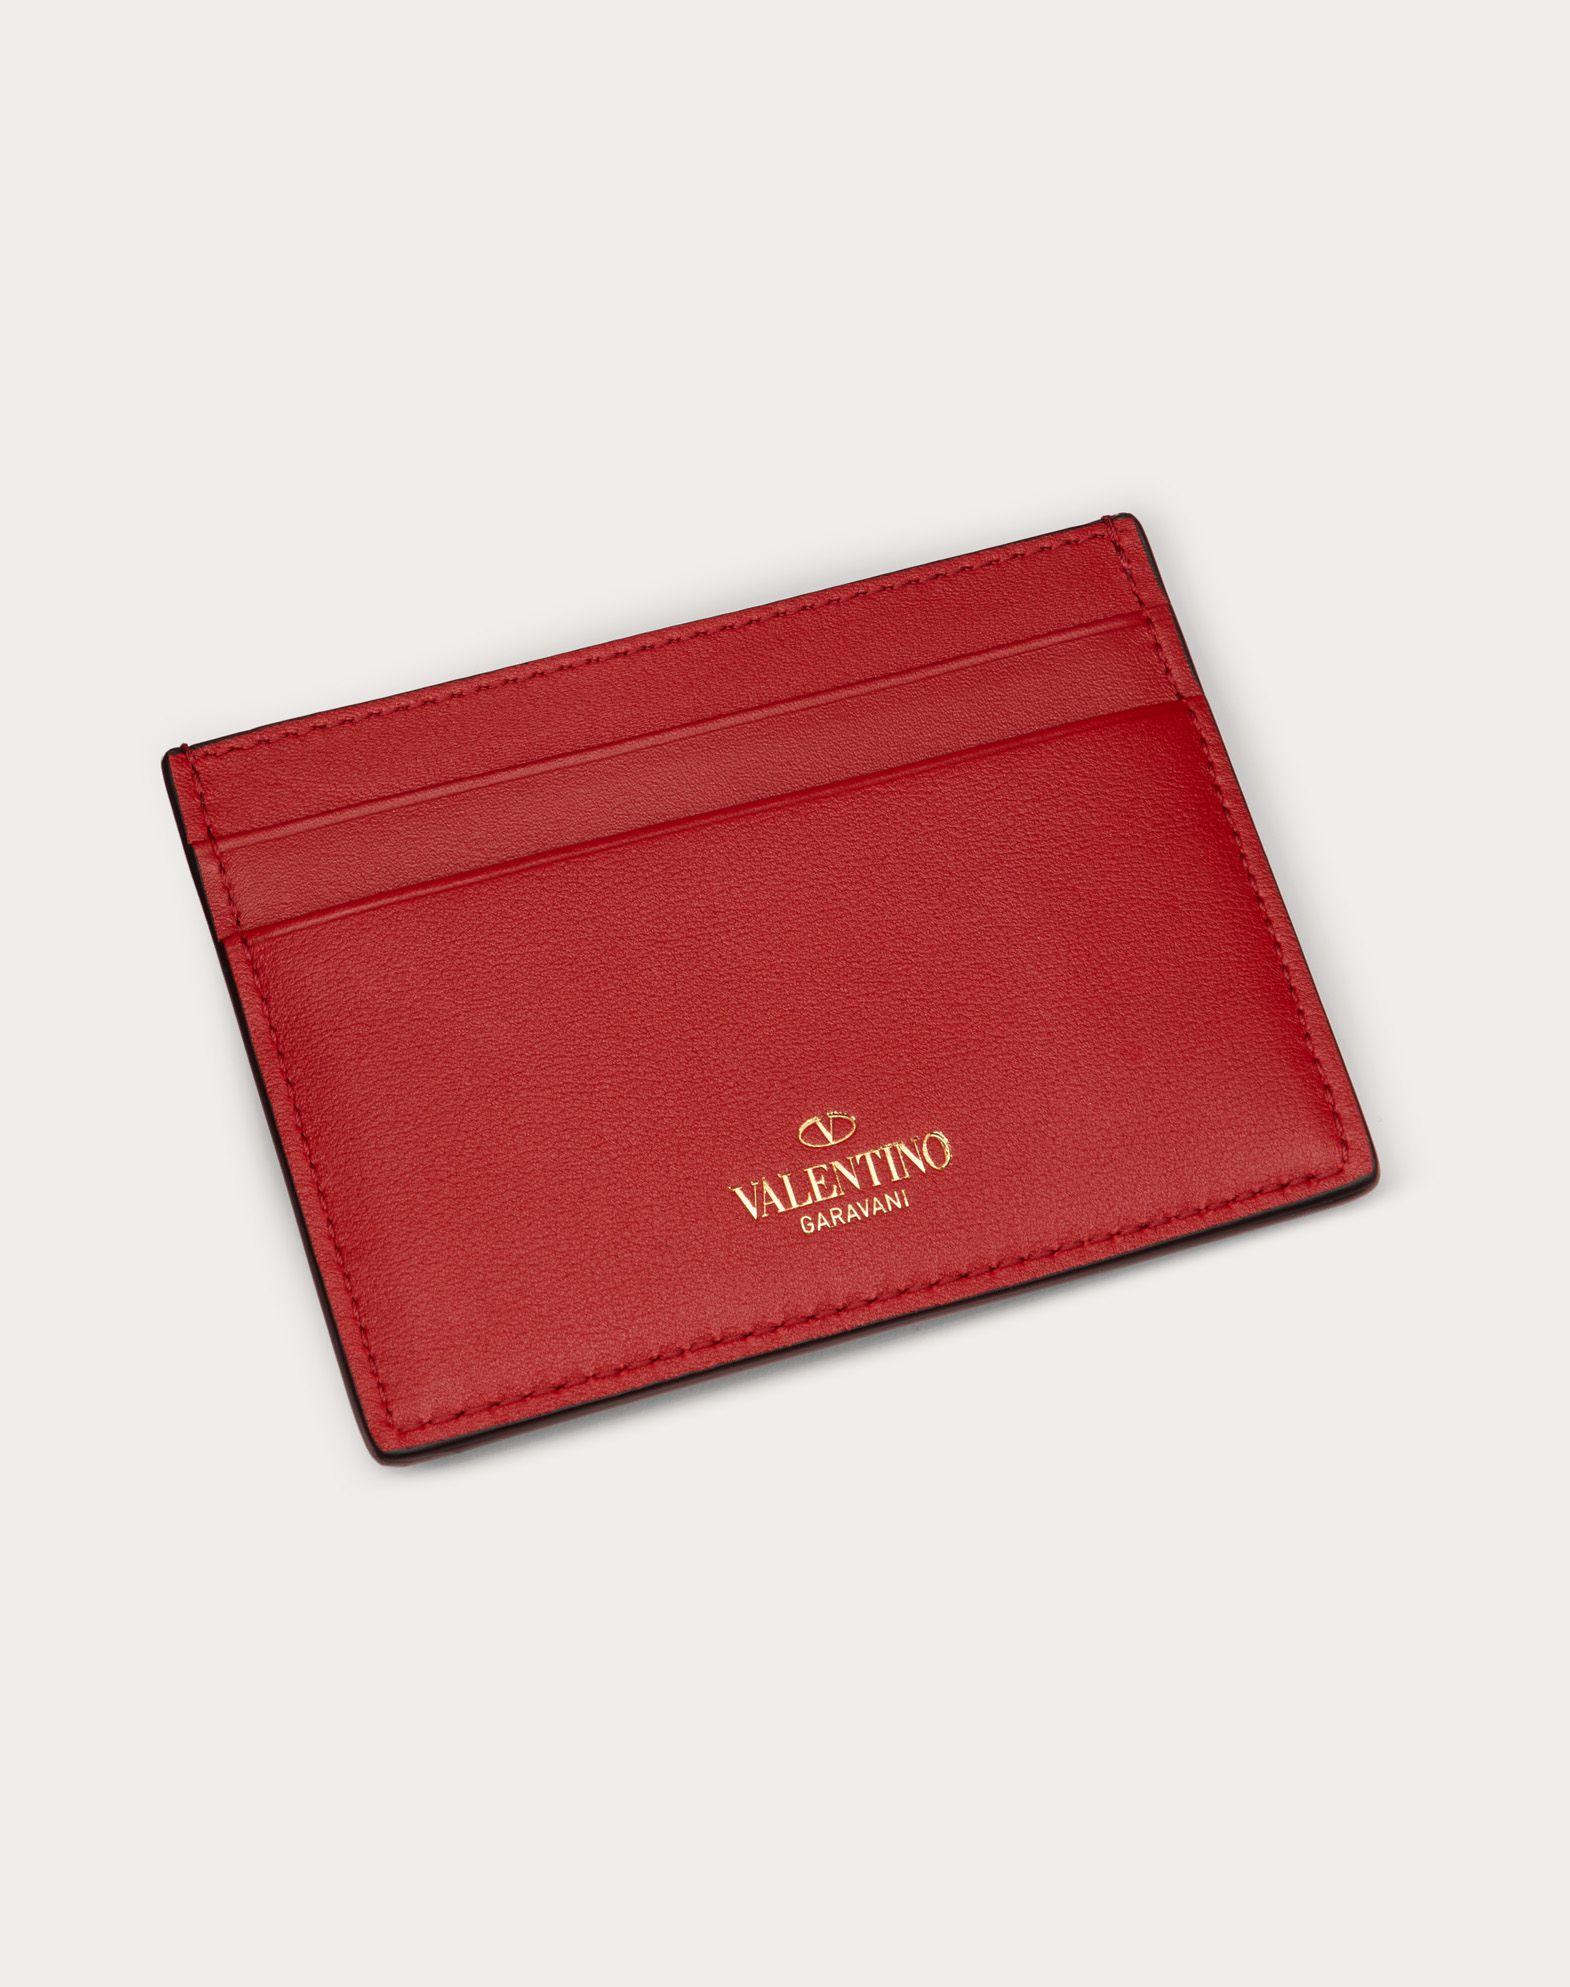 VALENTINO GARAVANI Rockstud Card Holder COIN PURSES & CARD CASES D d